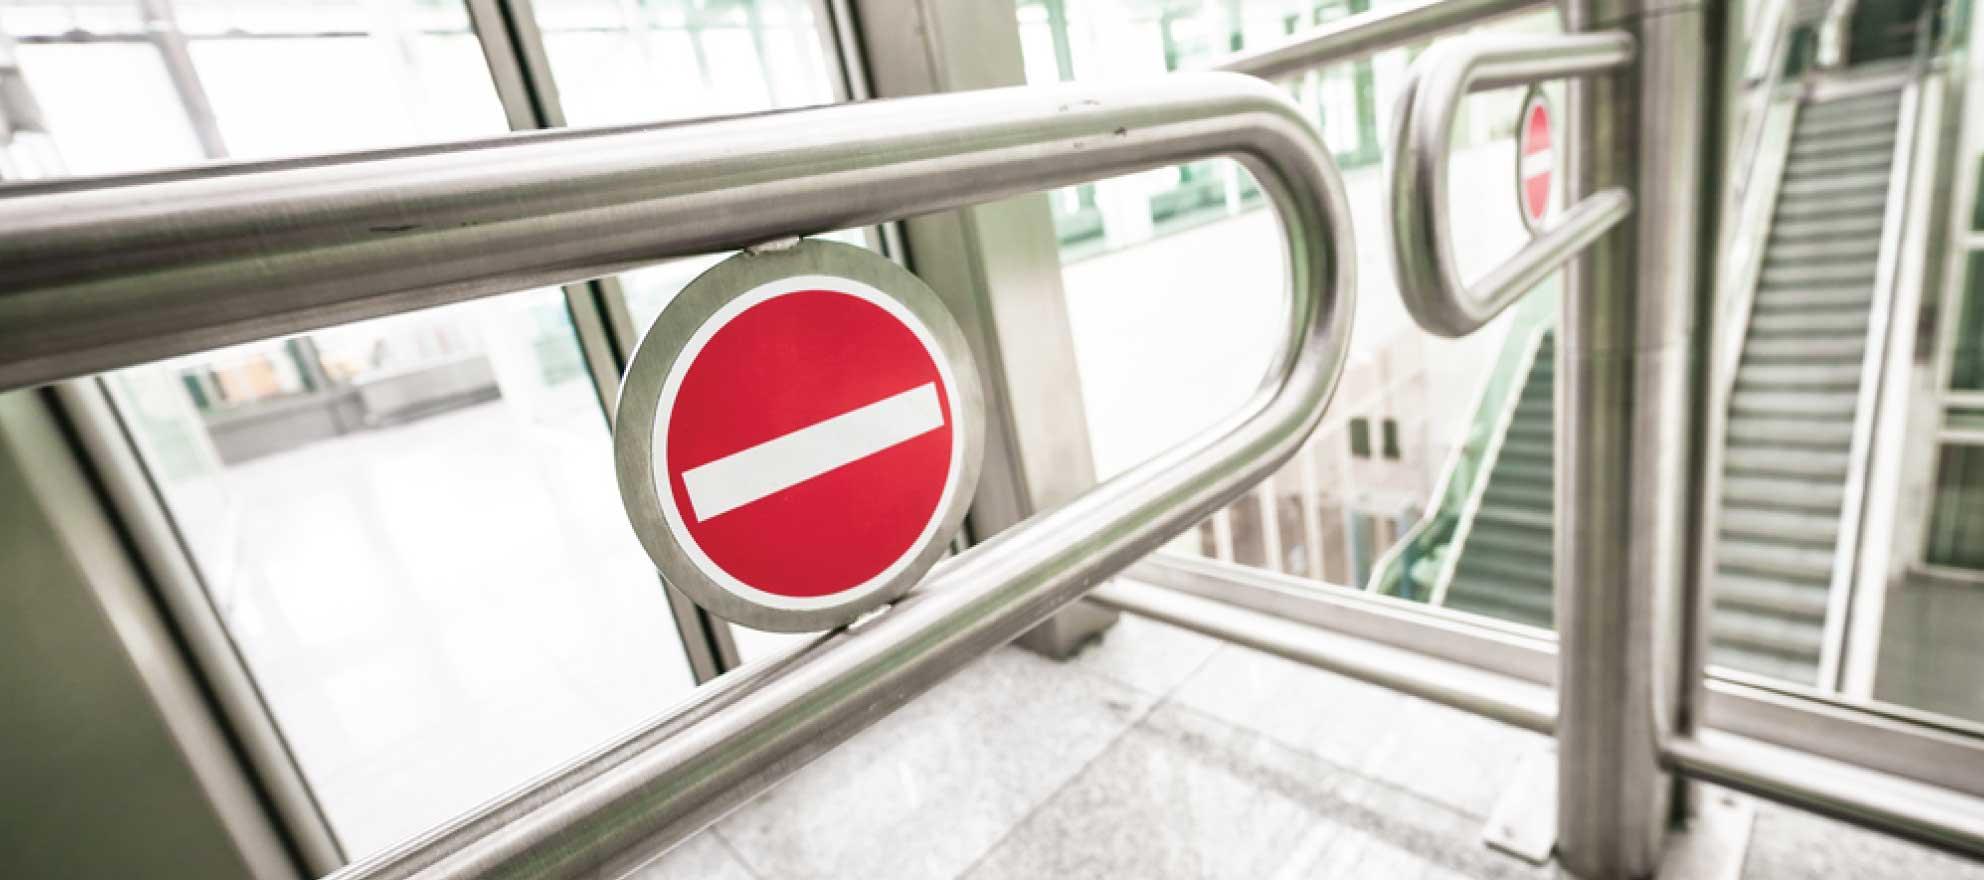 Why lending standards won't get better